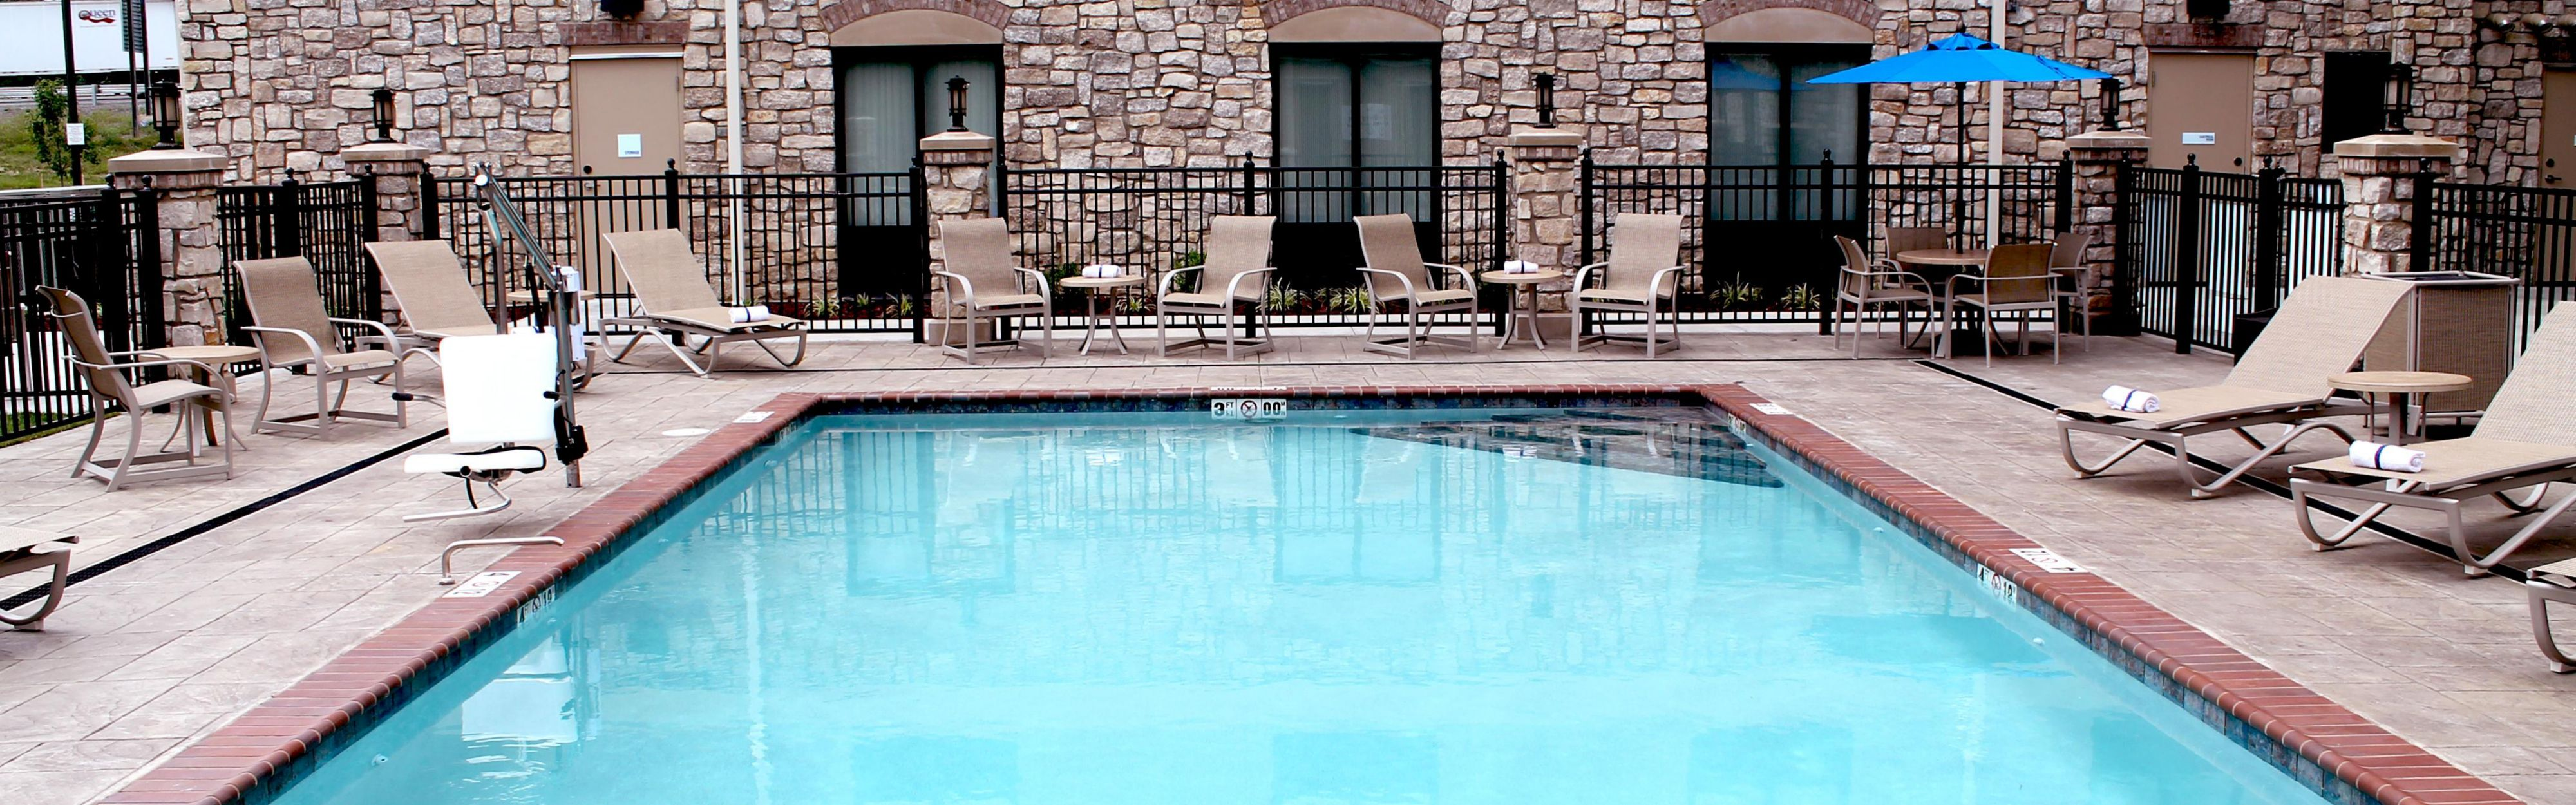 holiday inn express suites paducah west paducah. Black Bedroom Furniture Sets. Home Design Ideas